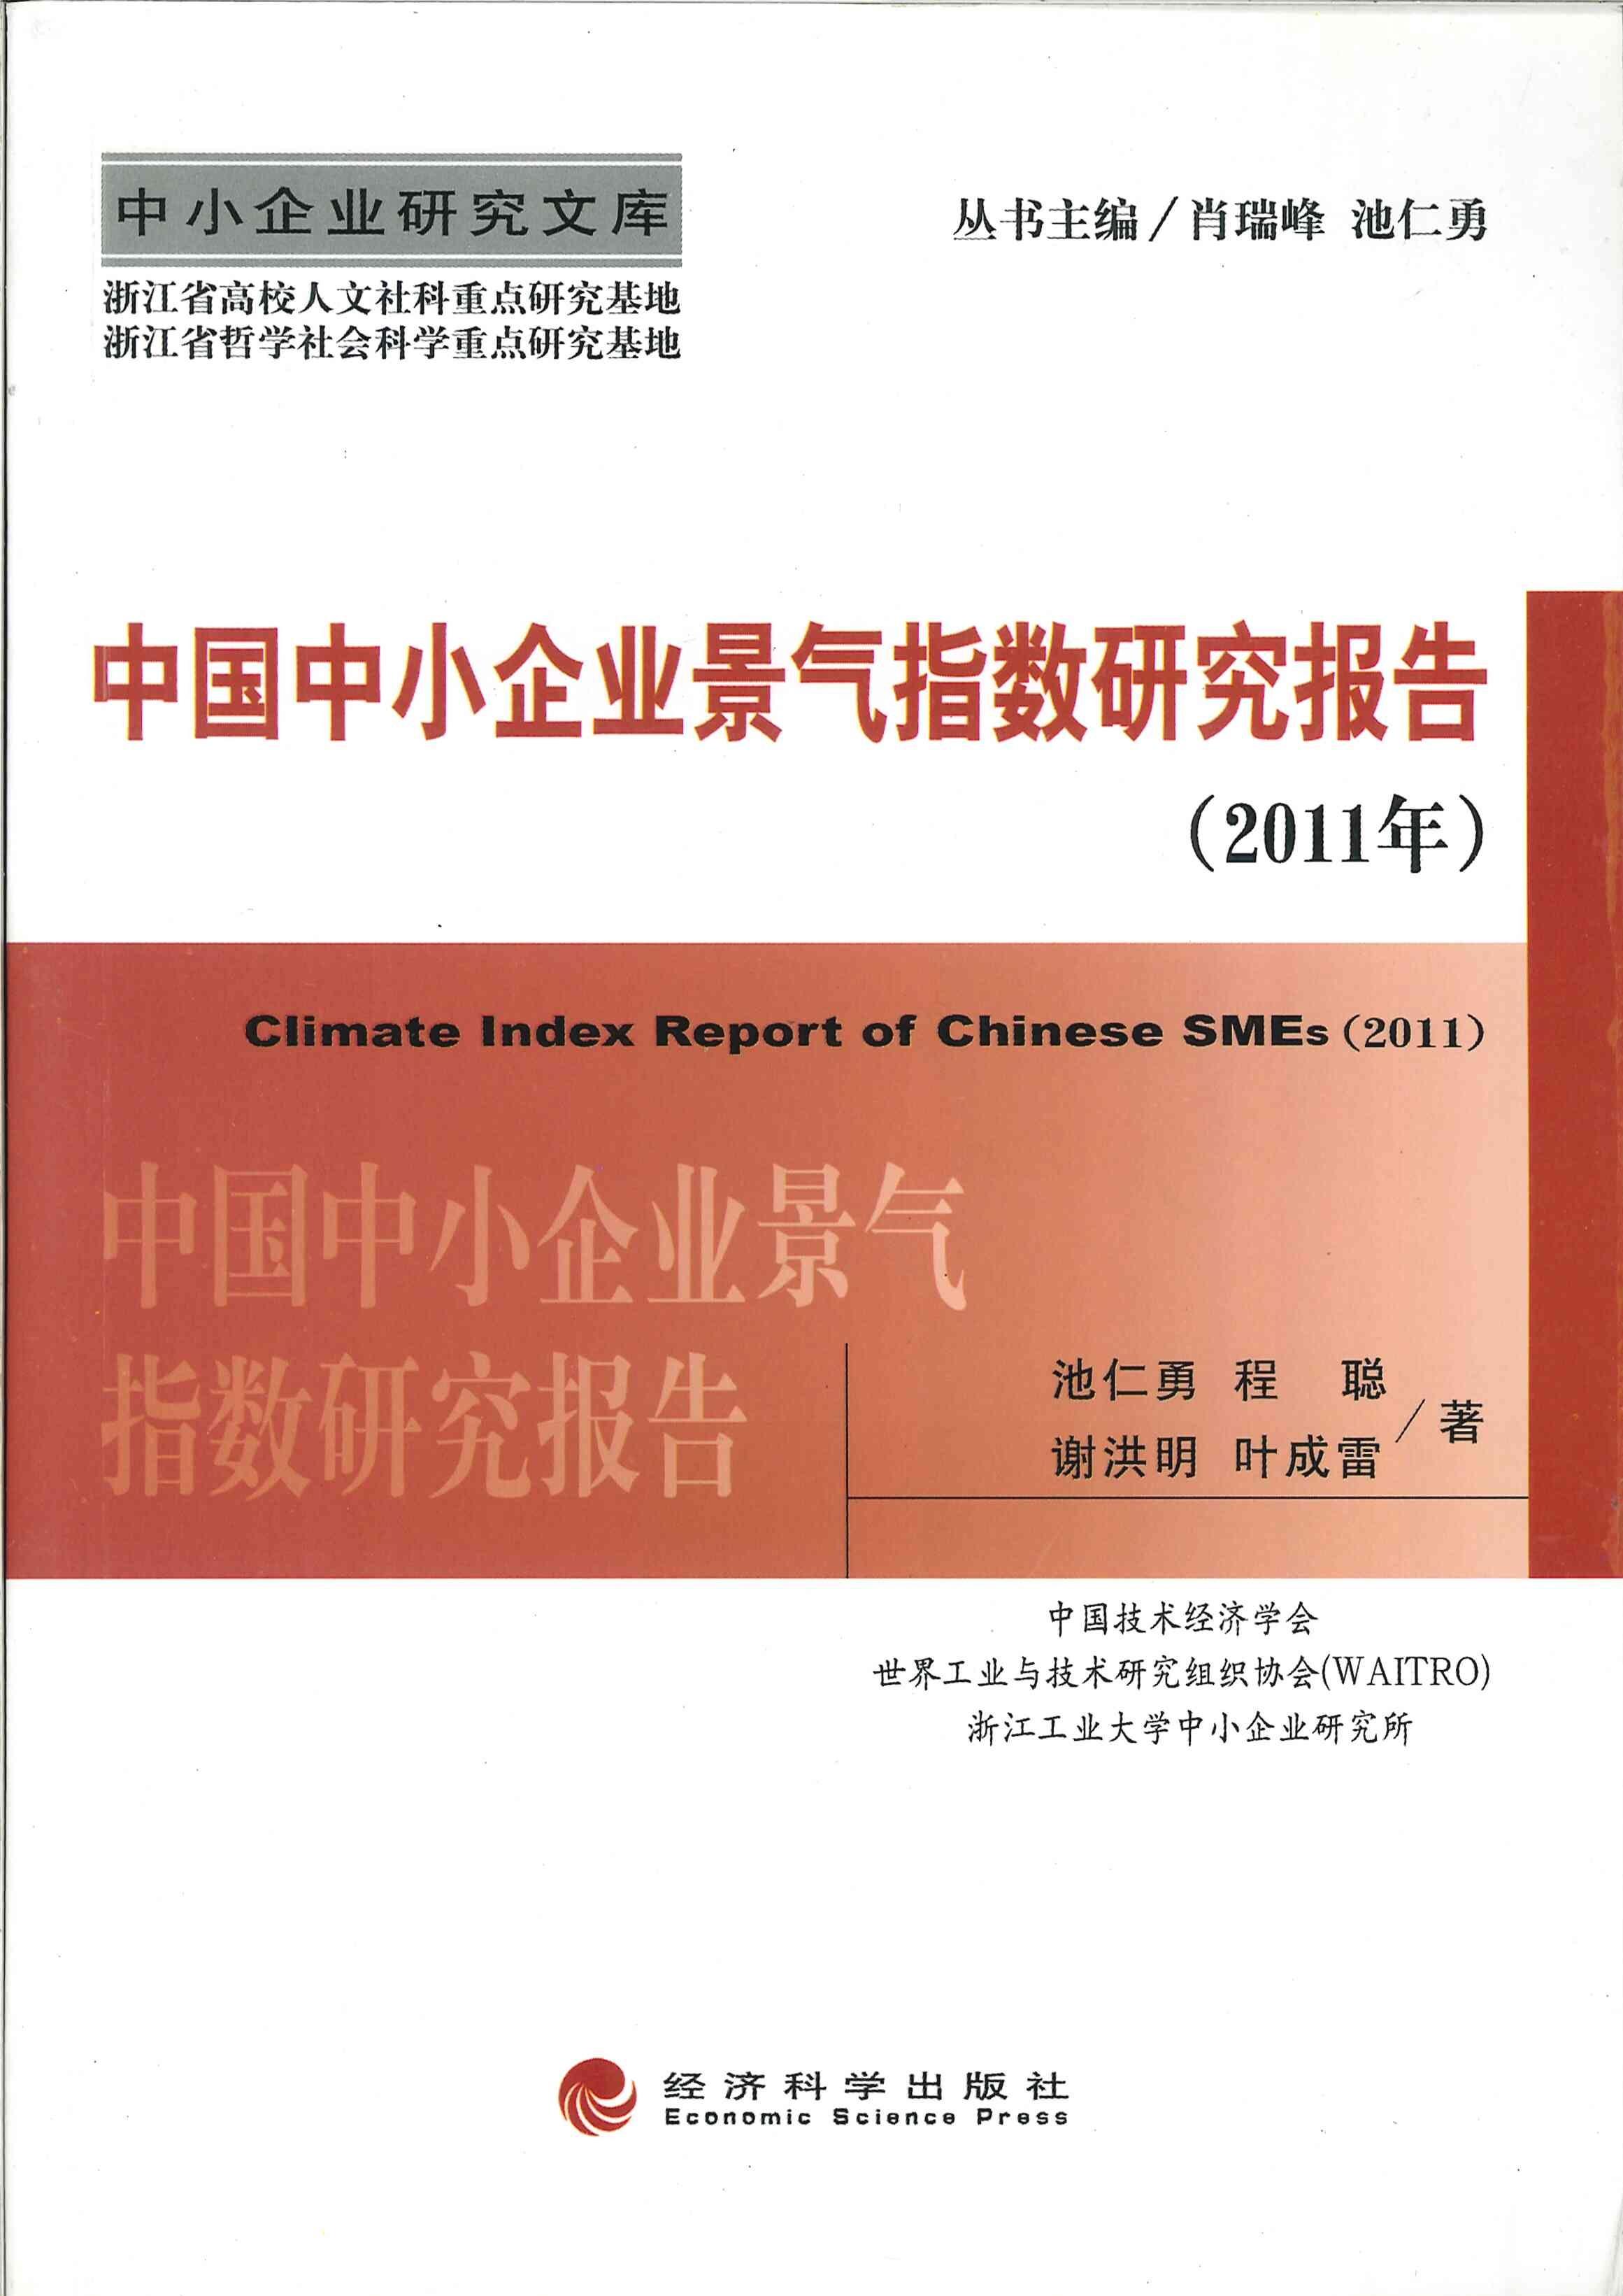 中国中小企业景气指数研究报告.2011=Climate index report of Chinese SMEs